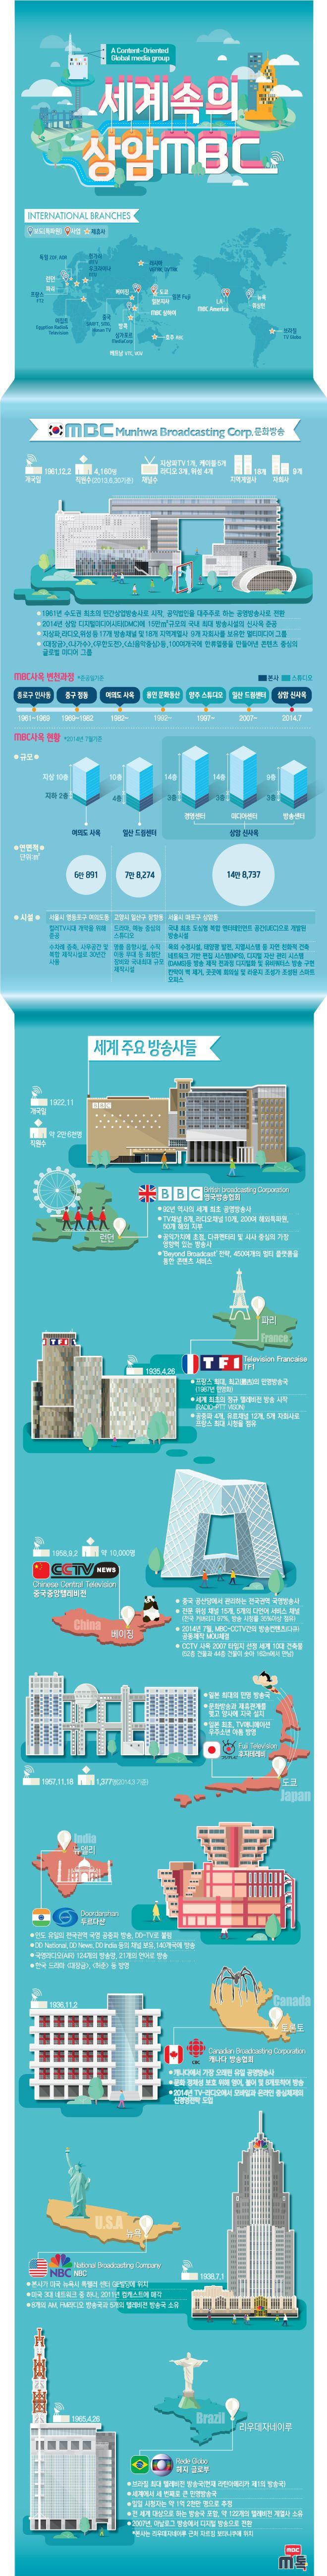 "Korean website – MBC 문화방송 공식 블로그 M톡 :: [인포그래픽으로 보는 MBC 신사옥] ""세계 속의 MBC, 미래를 엽니다"""